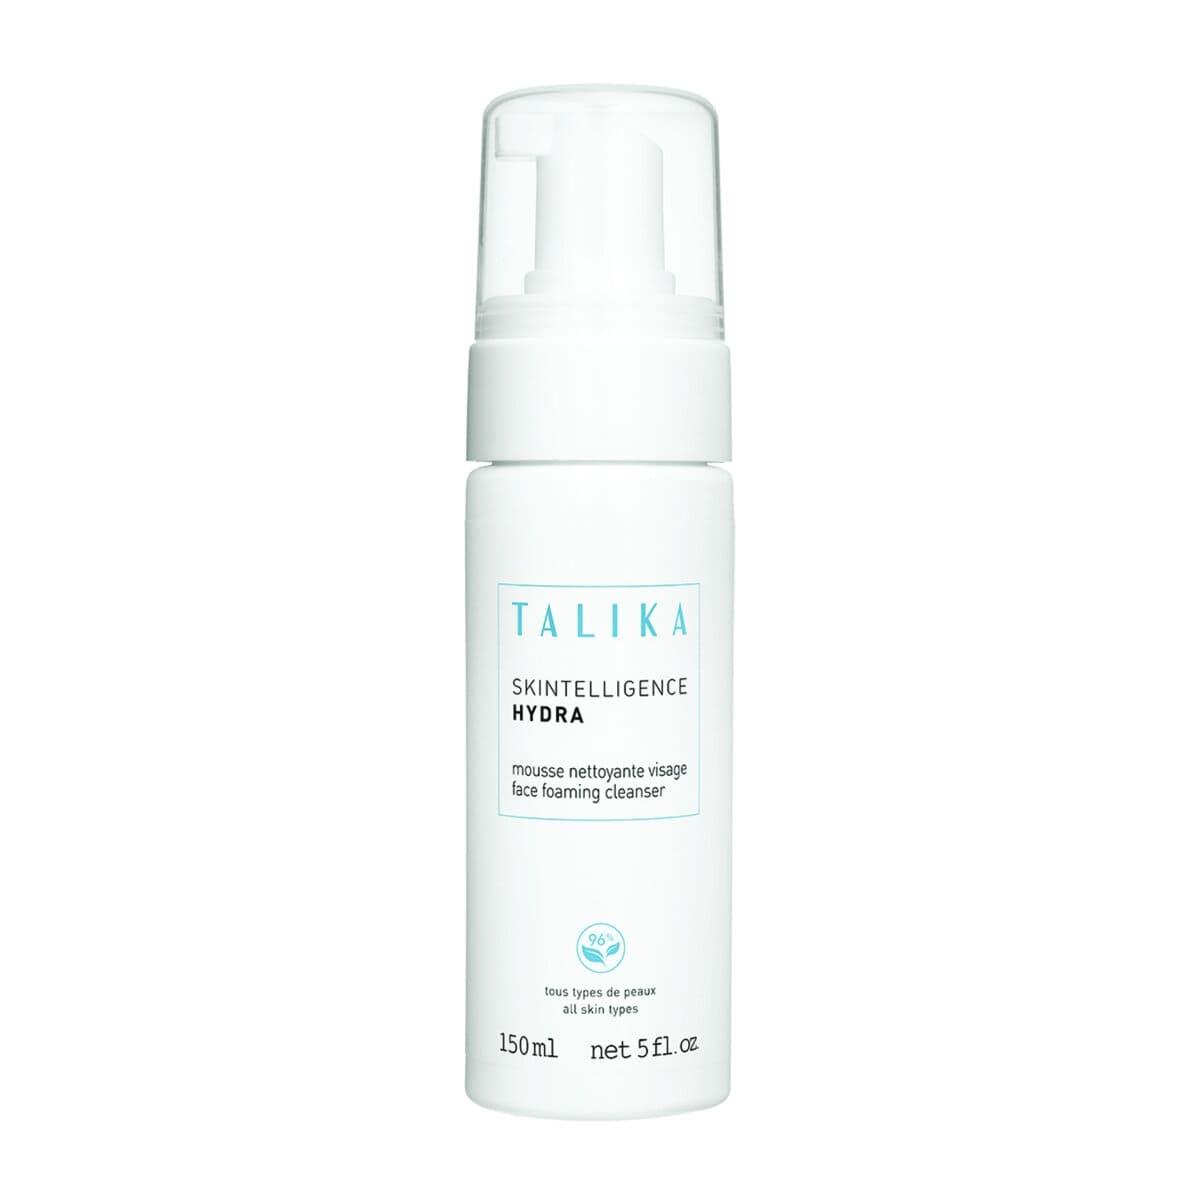 Skintelligence Talika Hydra Face Foaming Cleanser 150ml 150ml